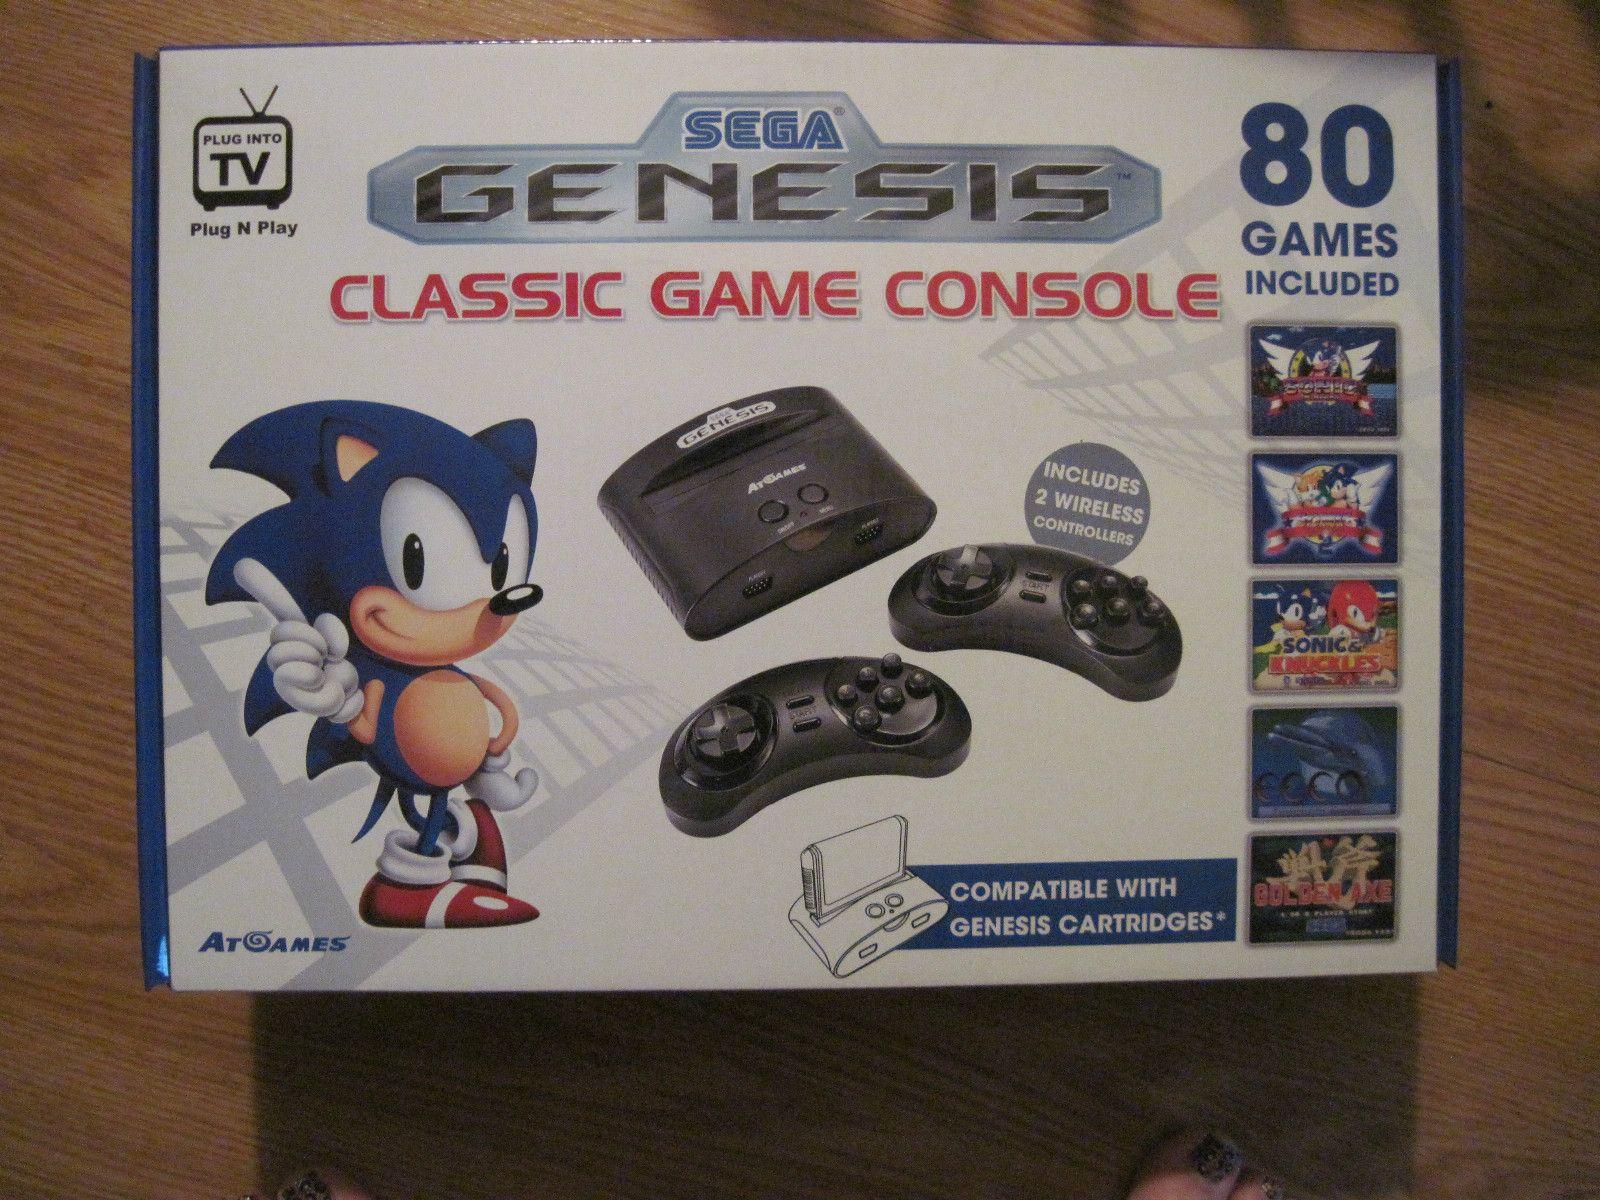 Atgames Sega Genesis Classic Game Console W 80 Built In Games New 2016 Model Atgames Sega Genesis Classic Classic Games Game Console